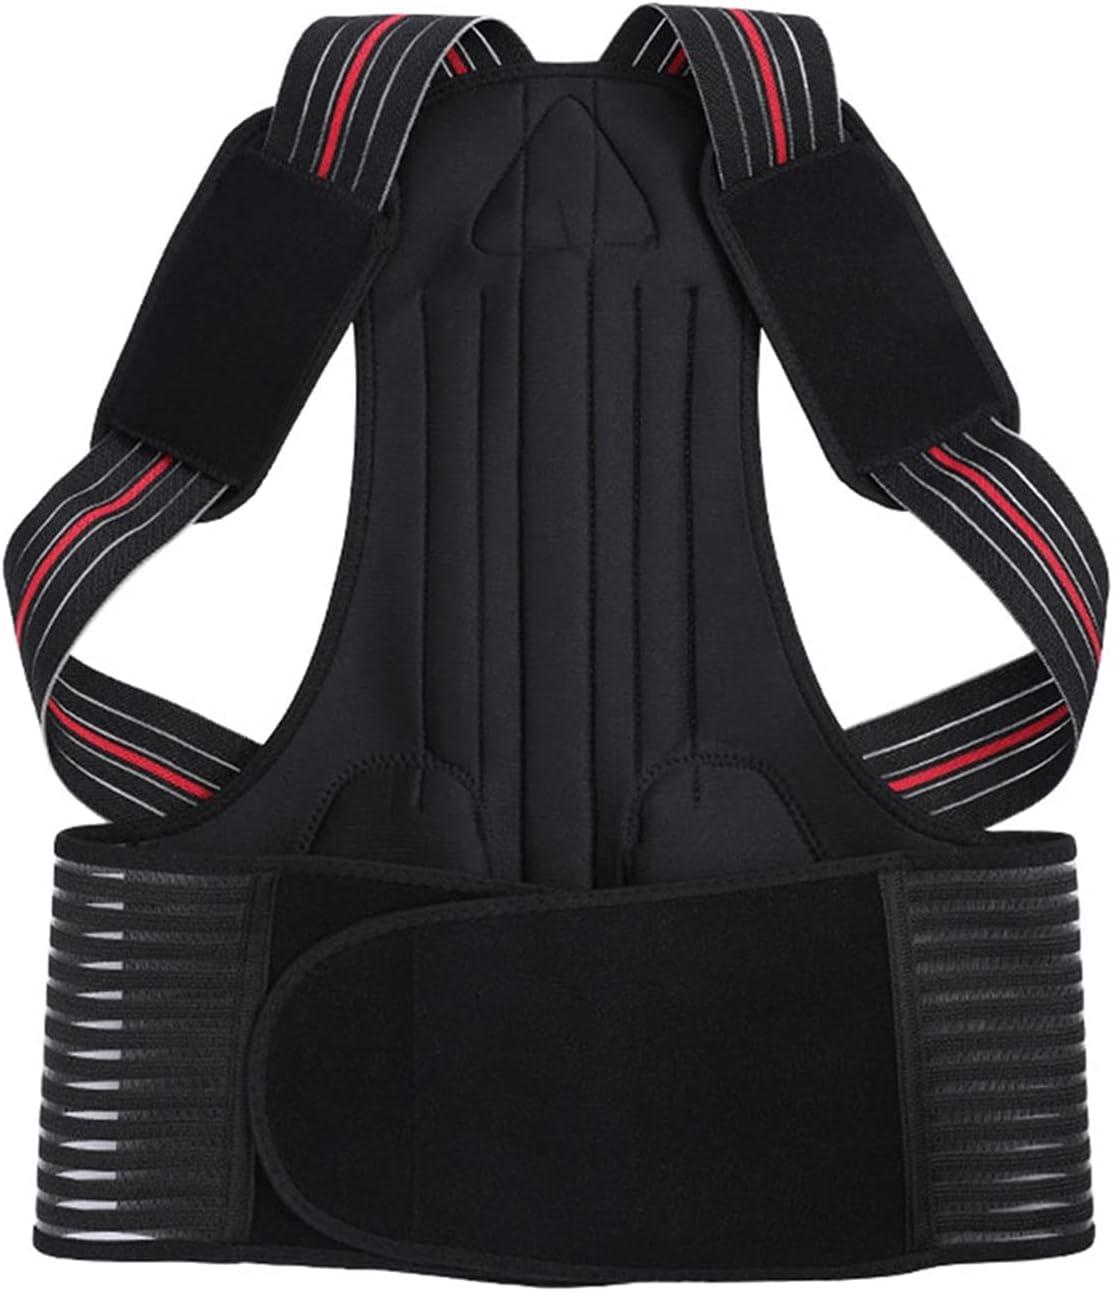 Tll-mm Posture Corrector Women's and Back Brac 4 years warranty Adjustable Popular Men's